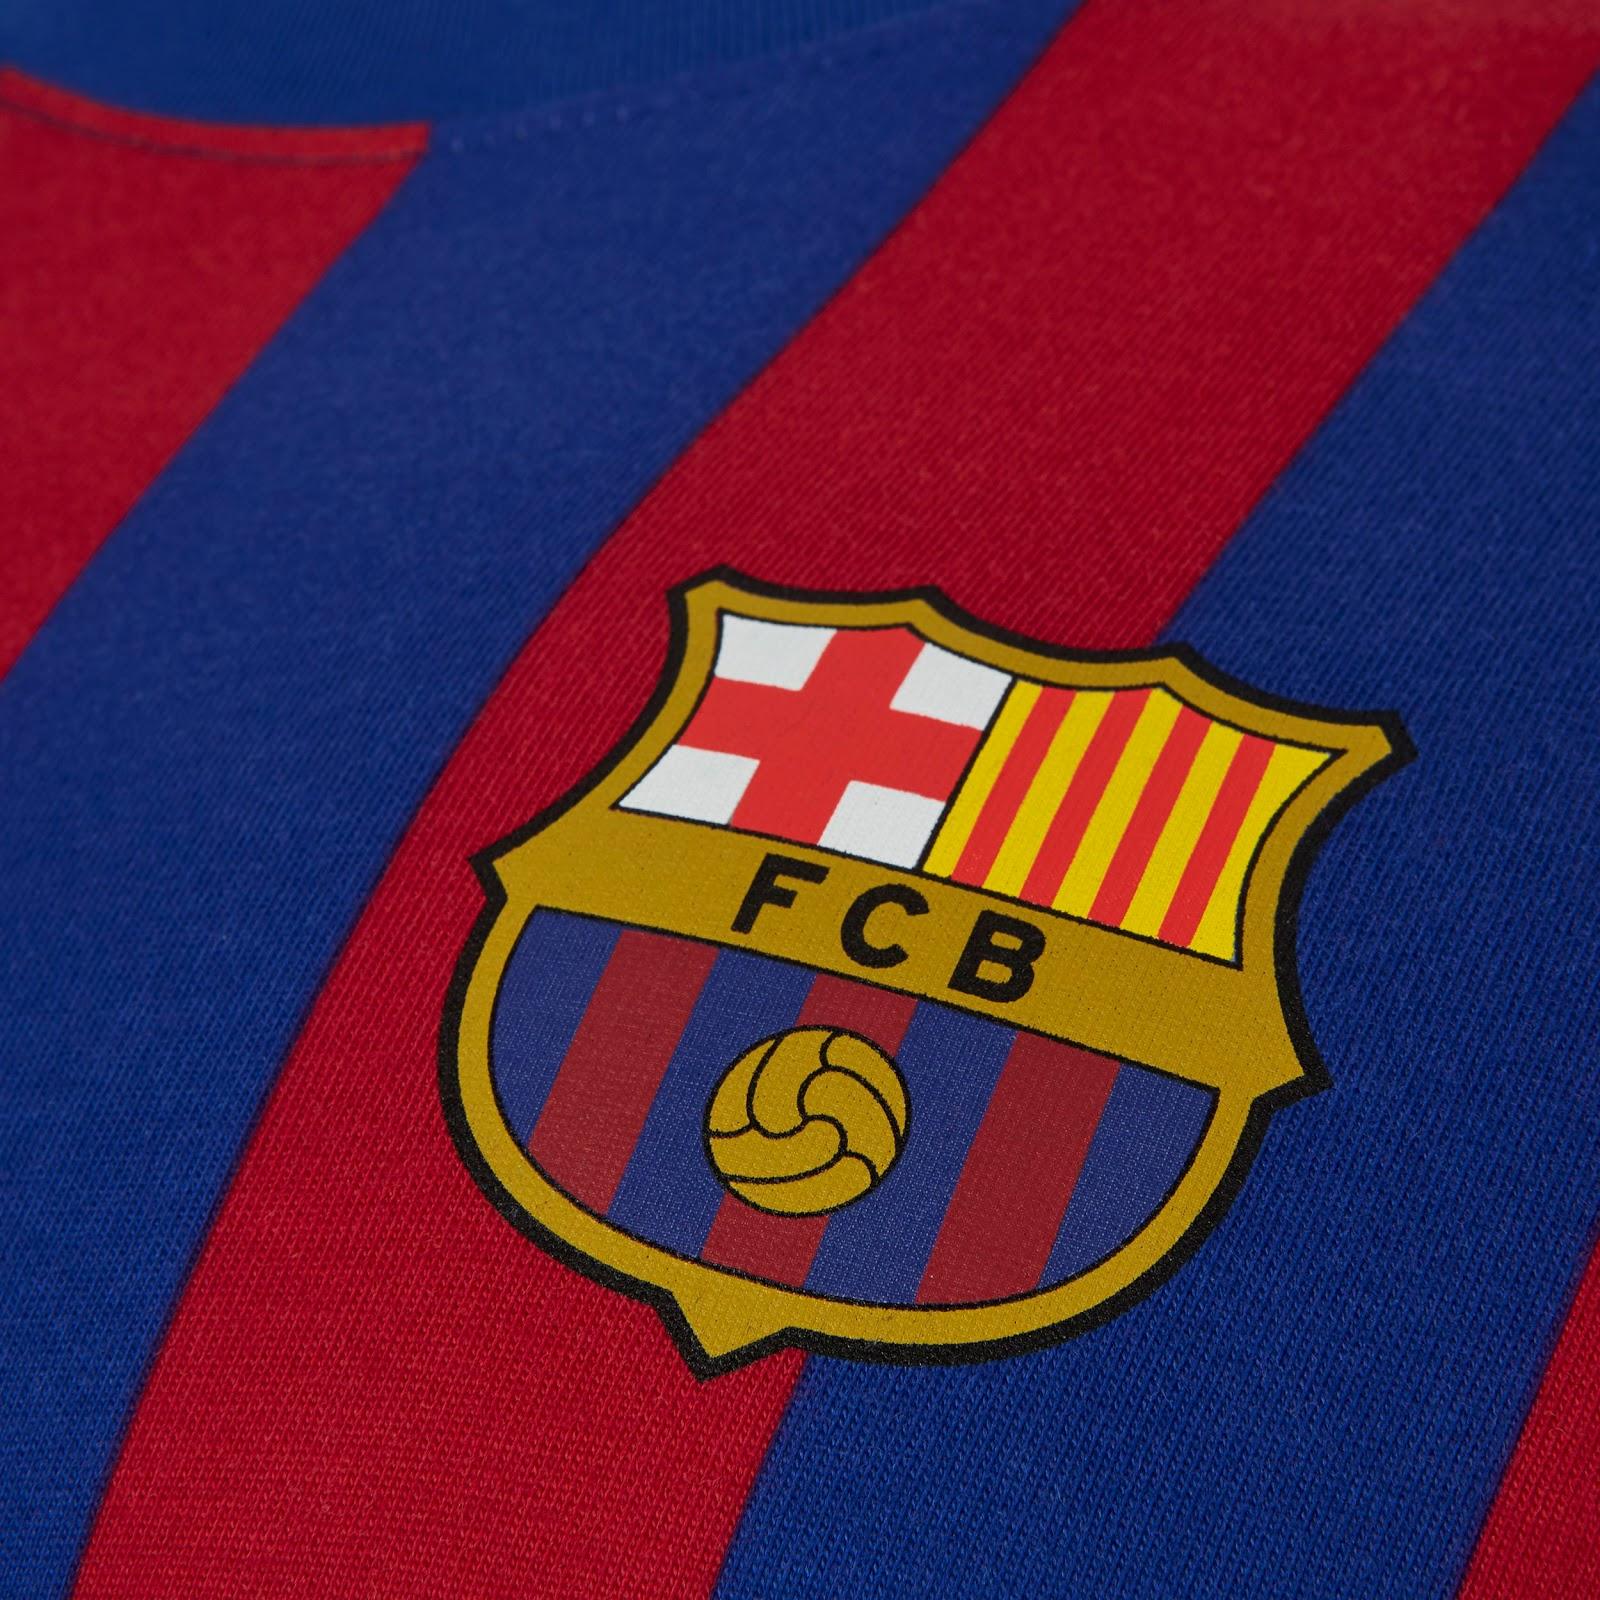 f0dd2fa6567ccd Classy Nike FC Barcelona 2019 LS Retro Shirt Released - Footy Headlines